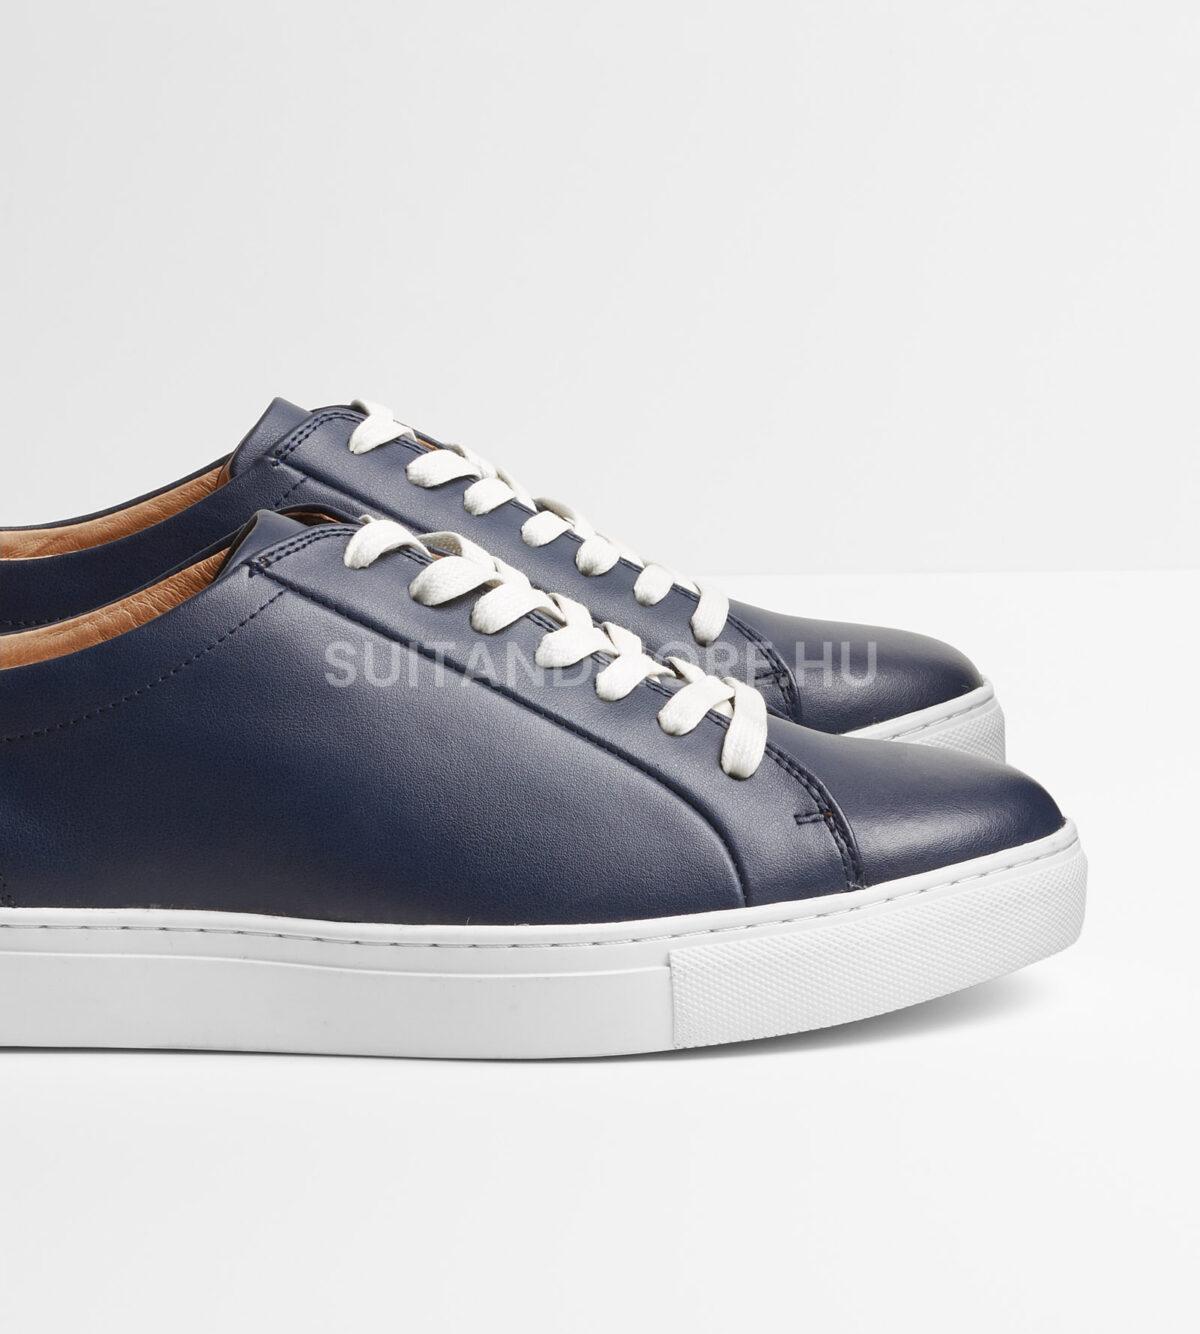 digel-kek-sneaker-cipo-seth-1189704-20-02